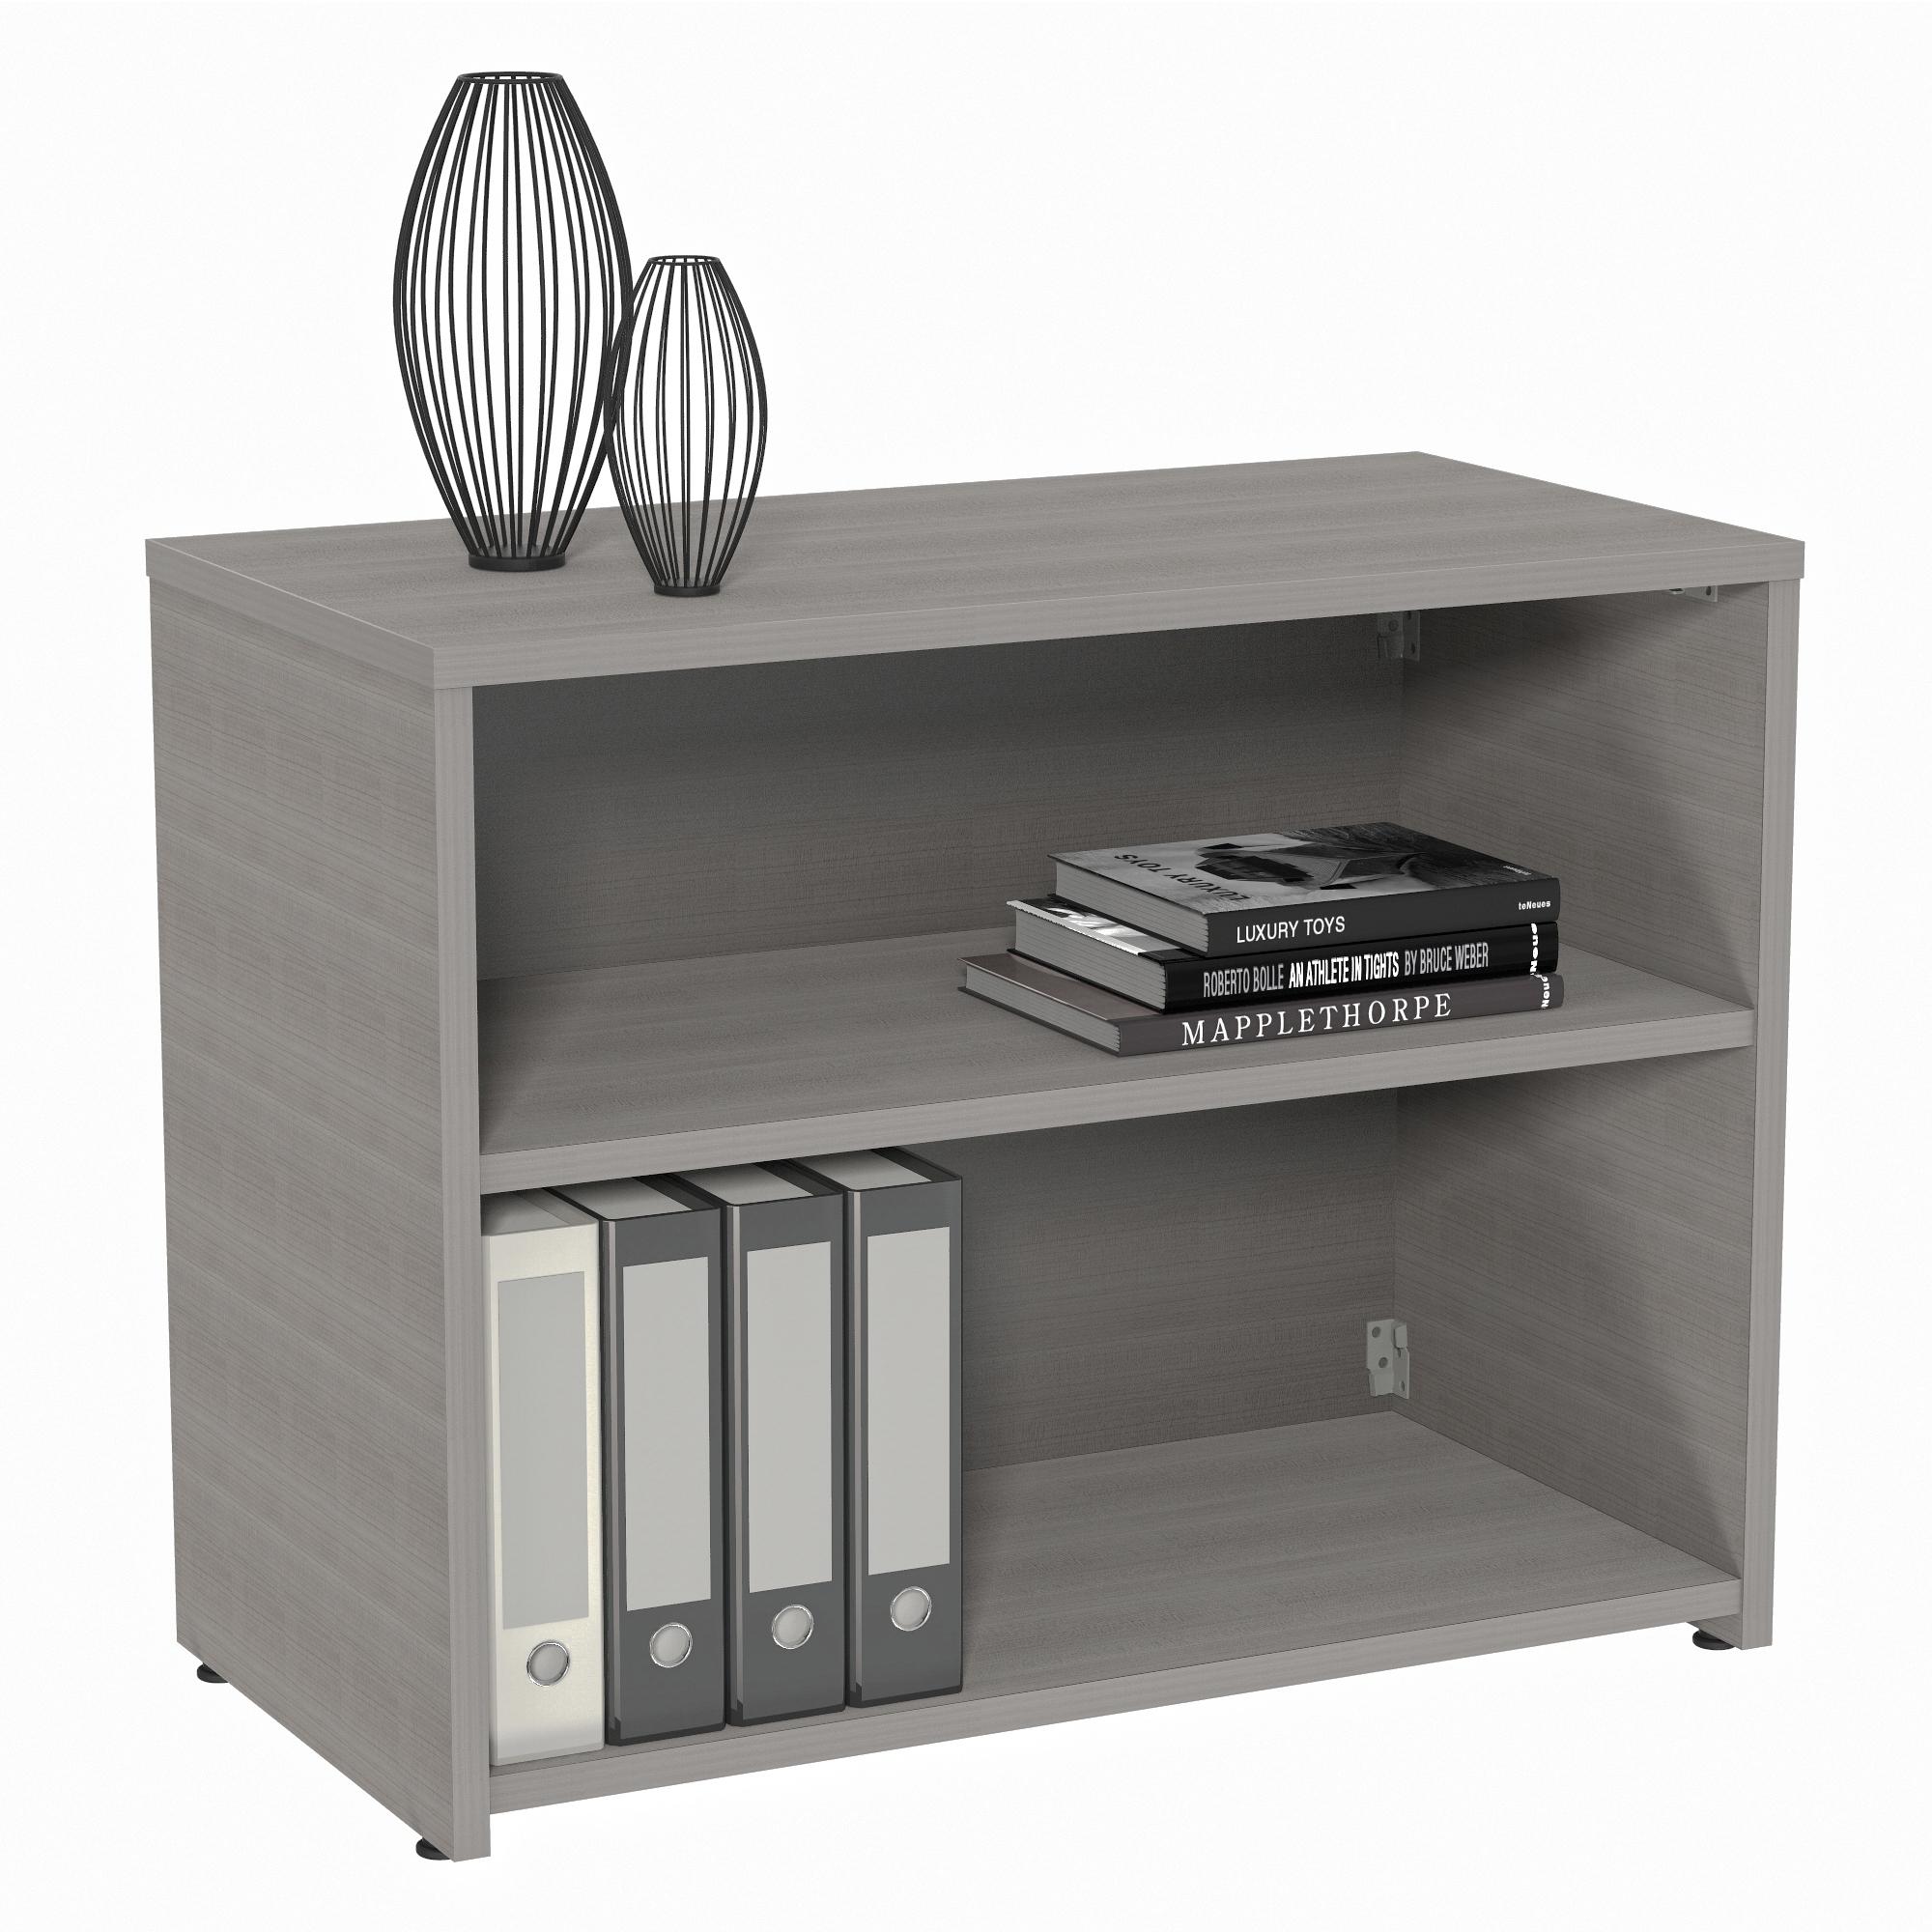 Urban Credenza Storage Modern Bookshelf Credenza 36 Wx16 Dx24 H Linea Italia Furniture